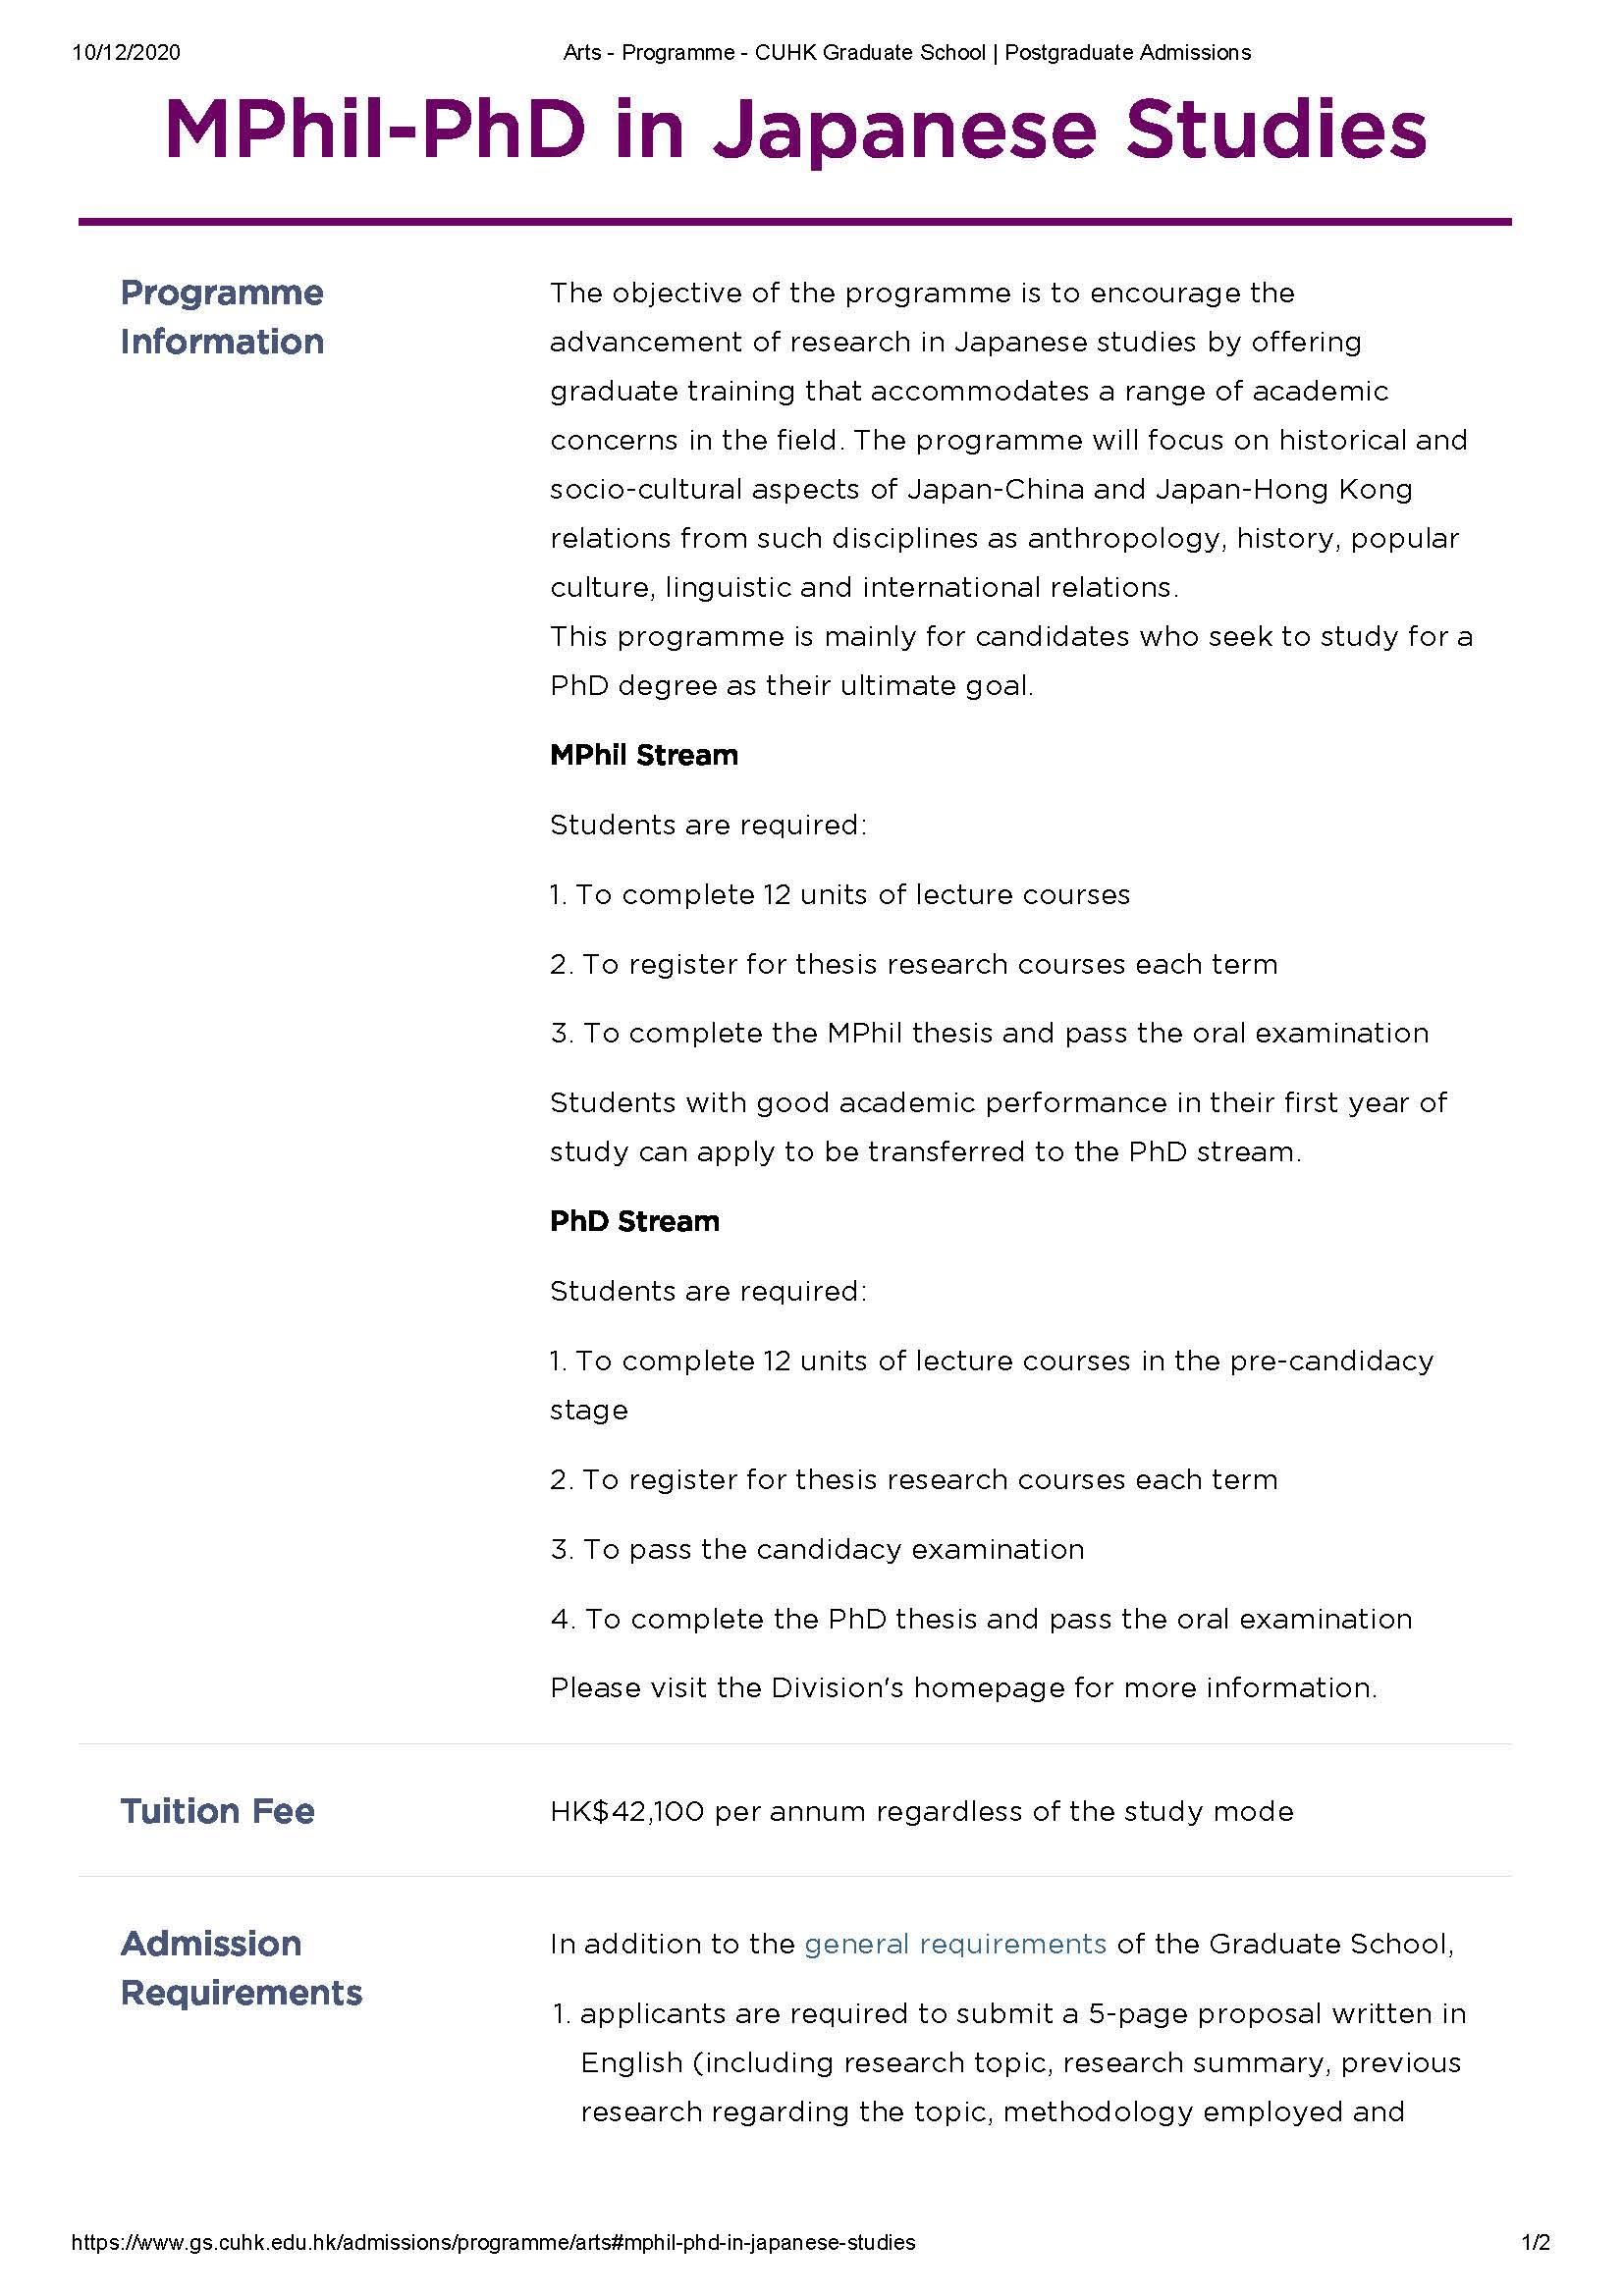 mphil phd programme summary